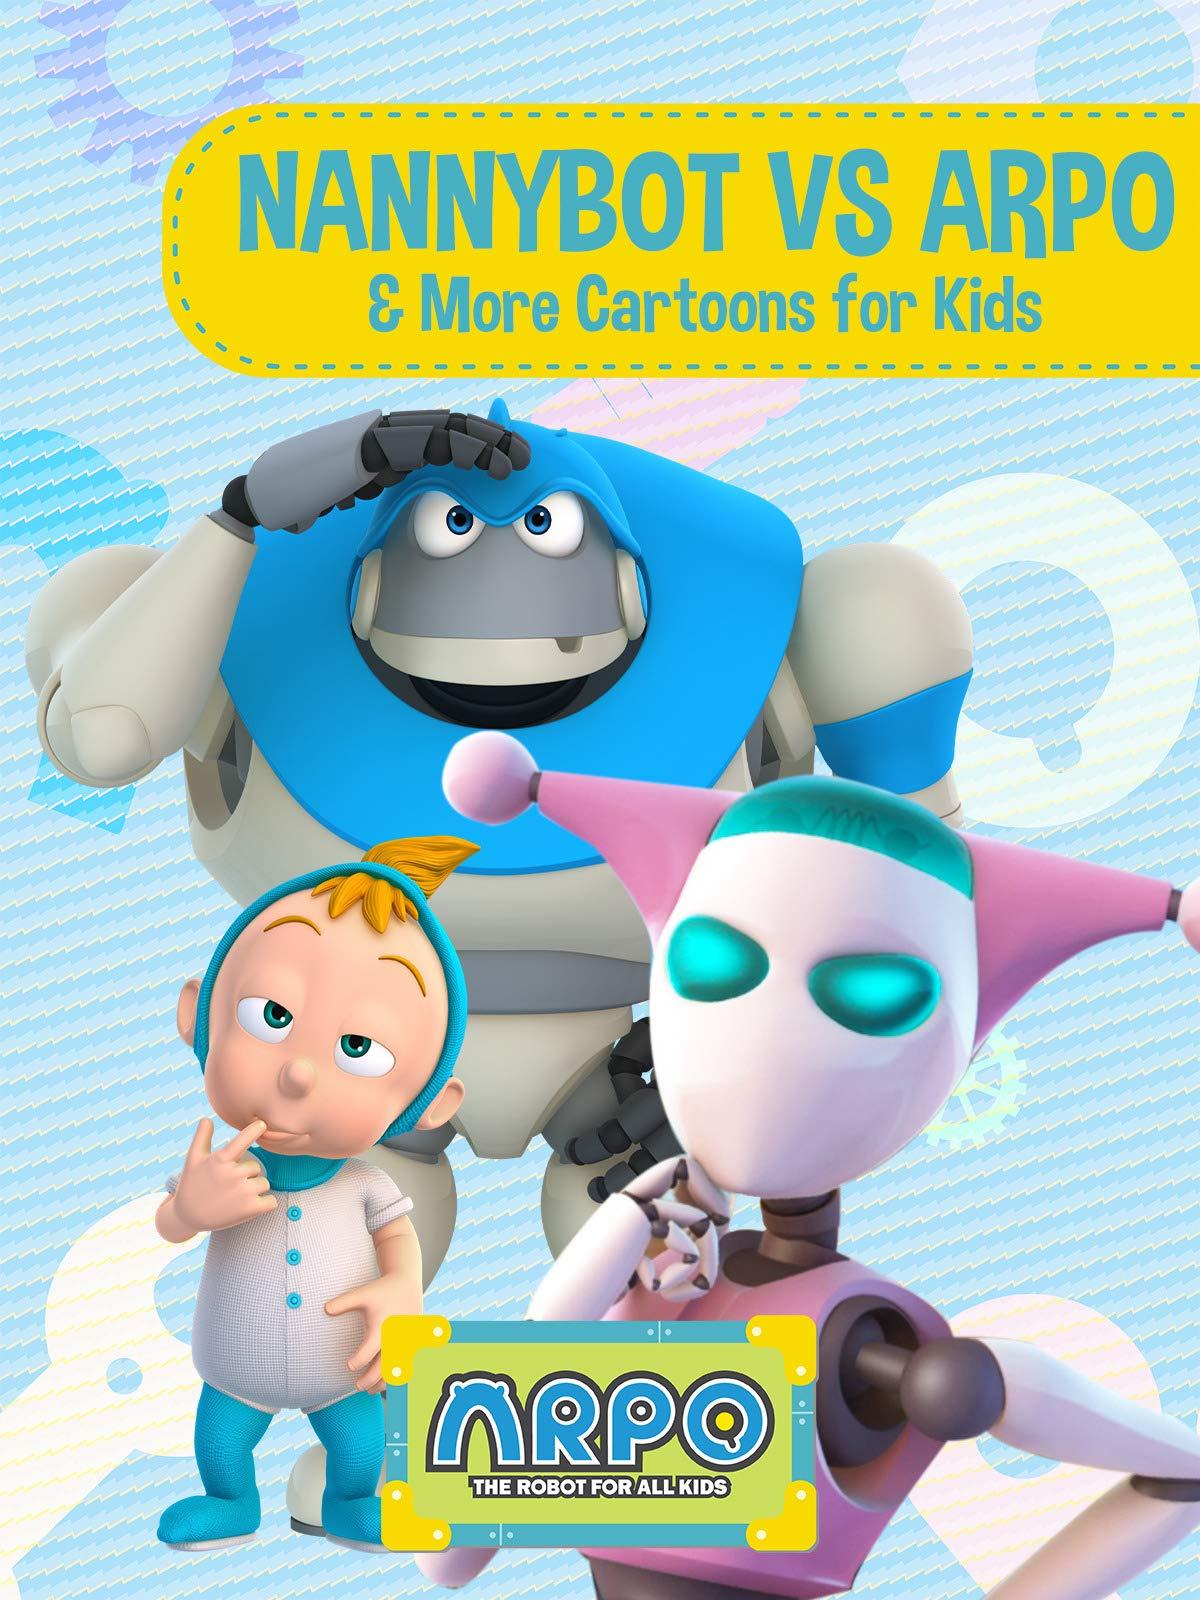 Arpo the Robot for All Kids  - NannyBot vs ARPO & More Cartoons for Kids